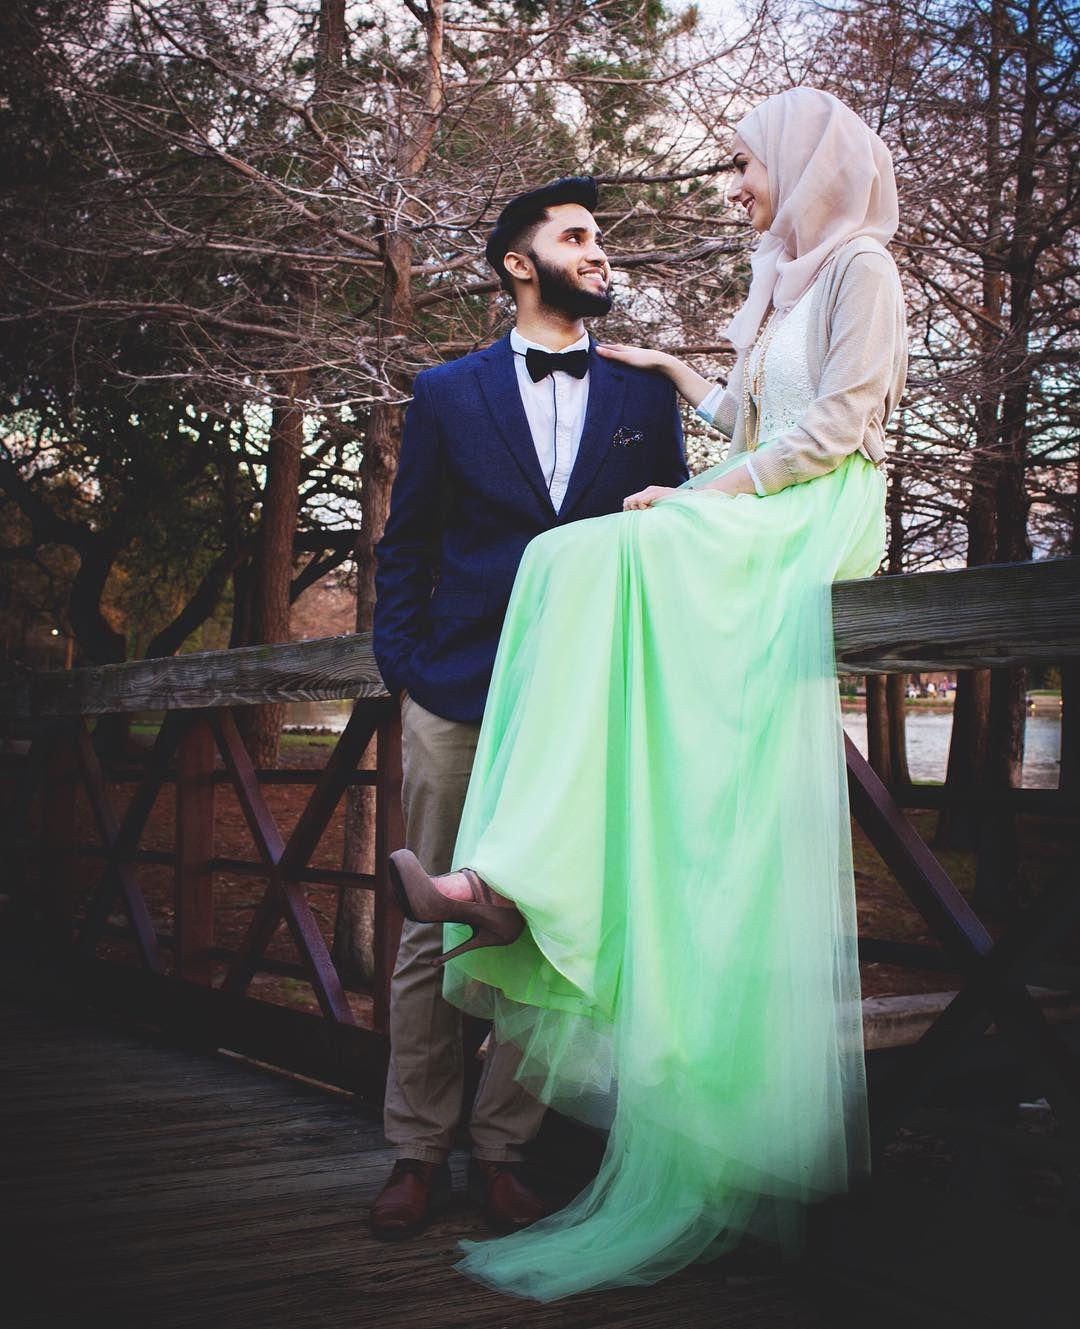 Romantic Marriage: Love The Dress Mwaah